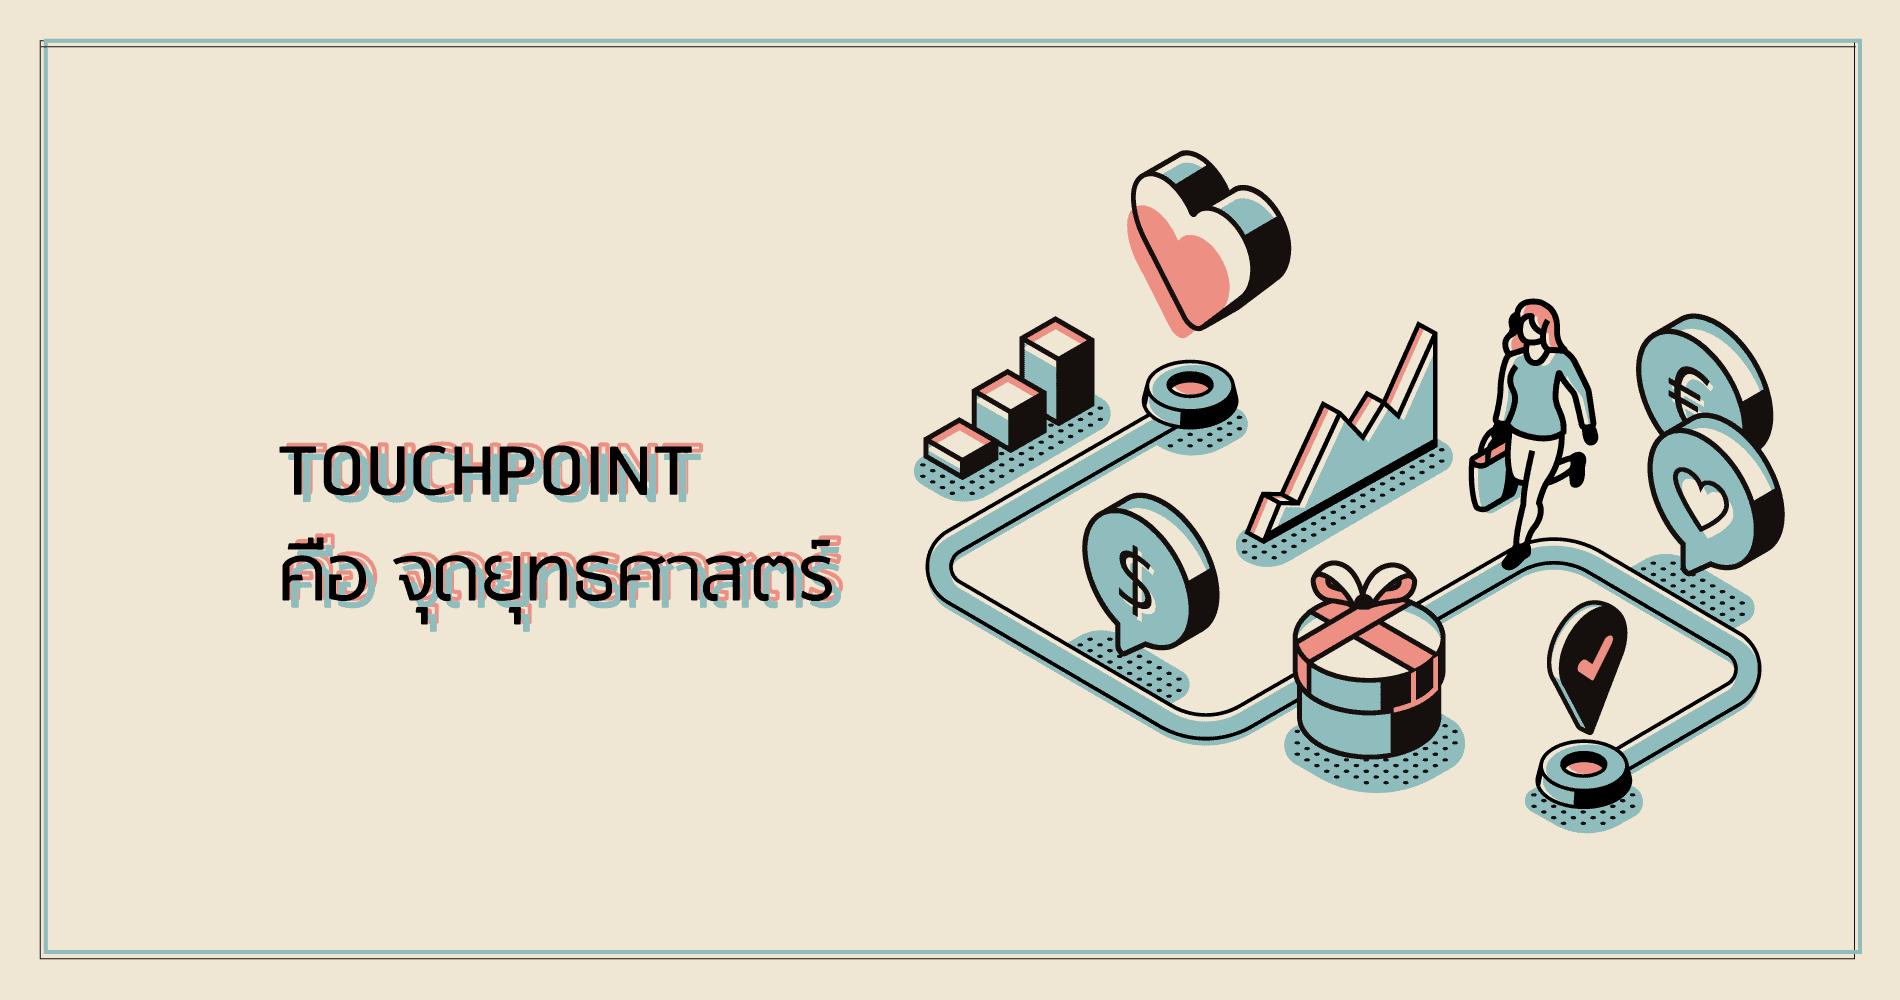 Touchpoint คือ จุดยุทธศาสตร์